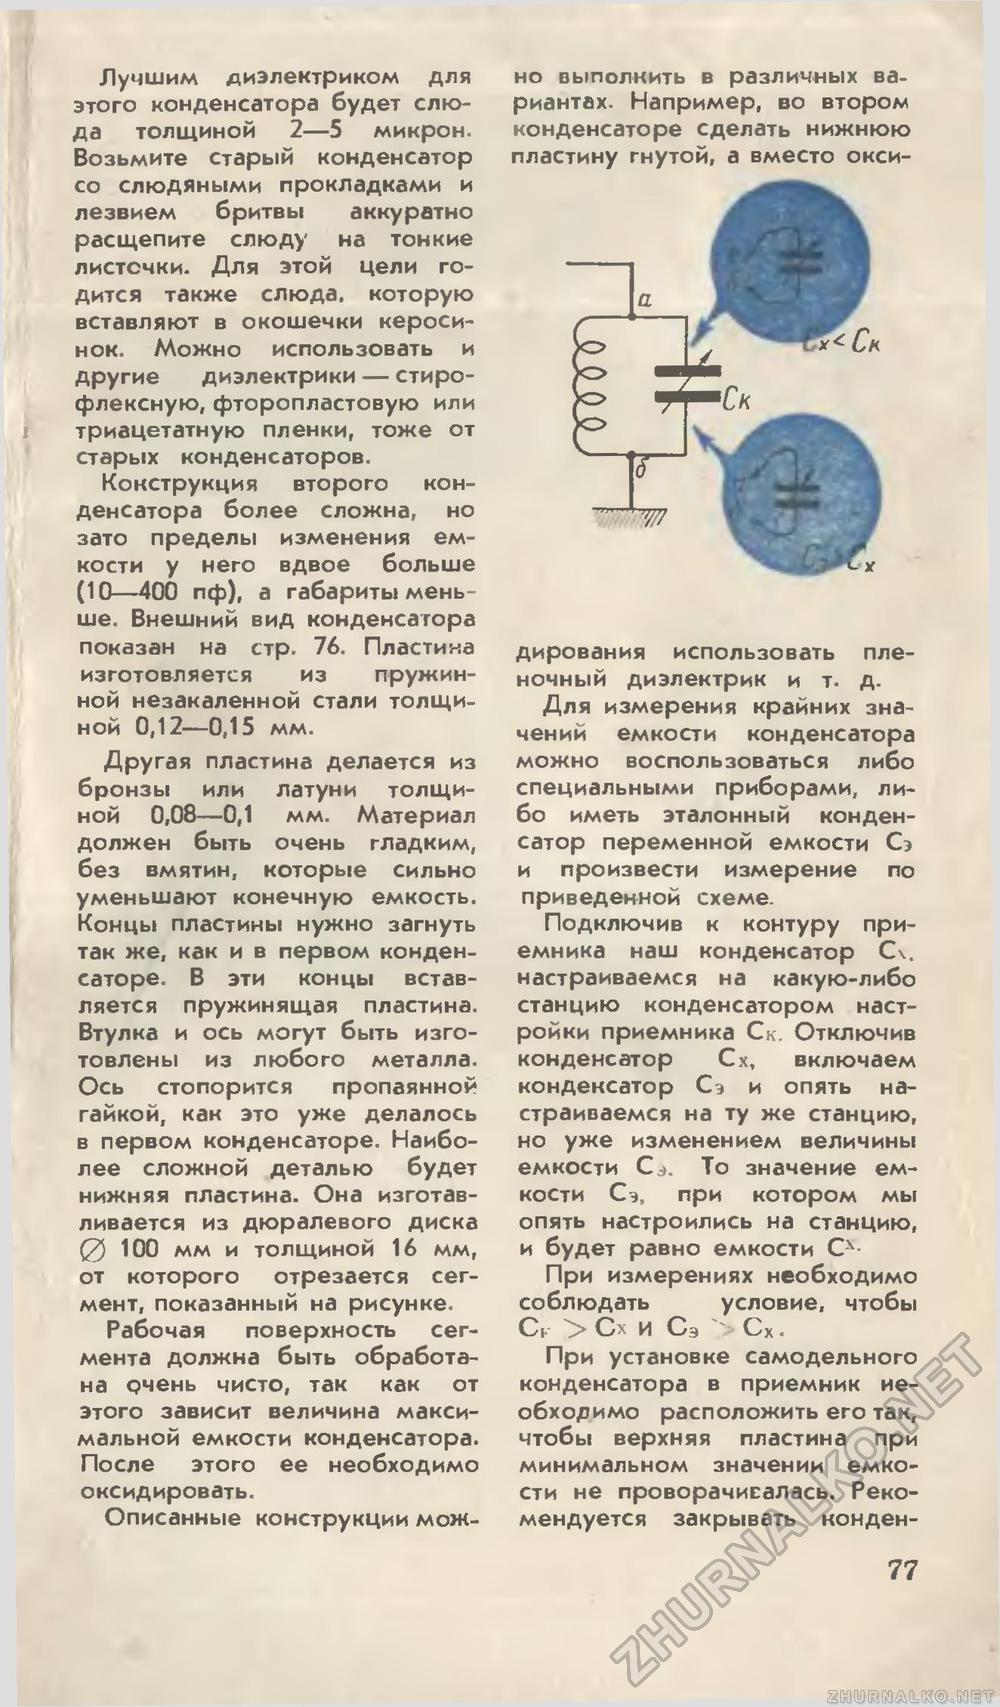 Проверка конденсатора. Прибор для 99